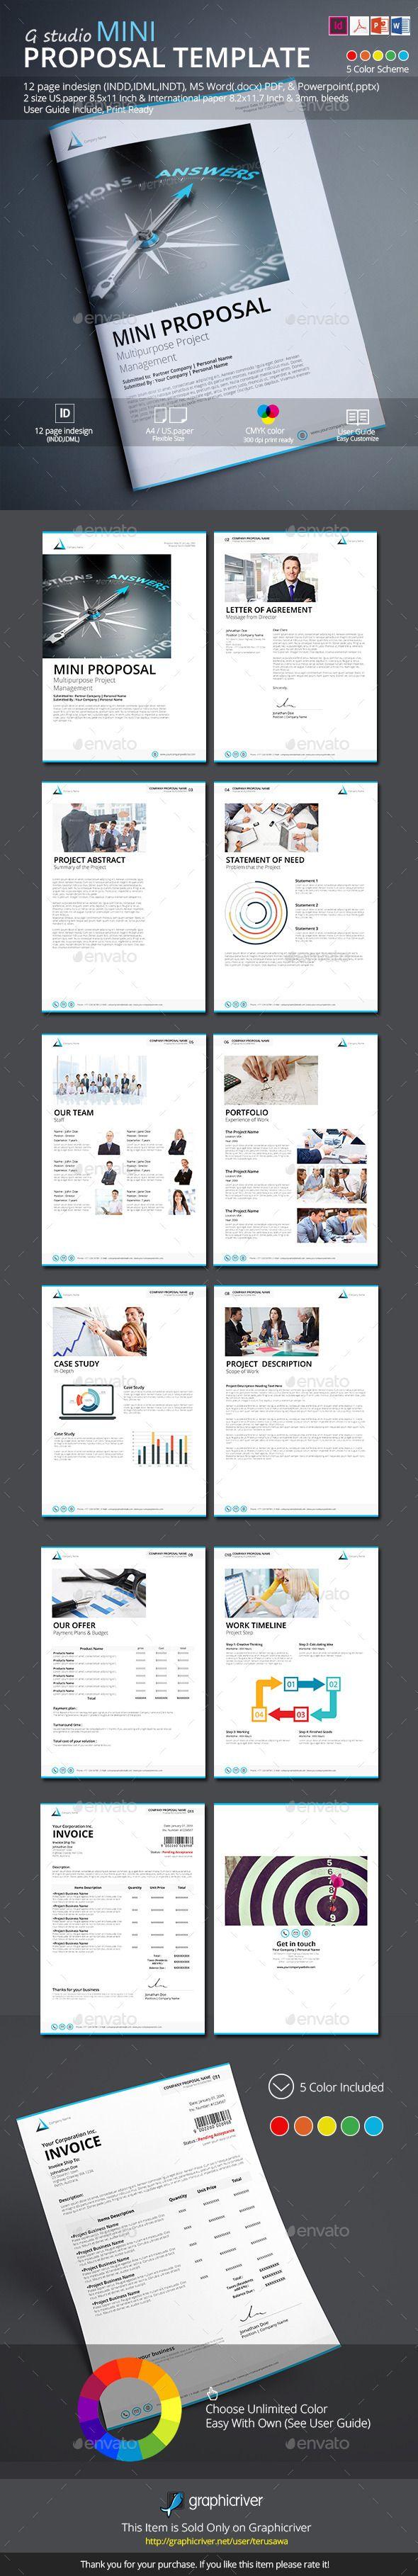 Mini Proposal Template Design Download Graphicriver Item